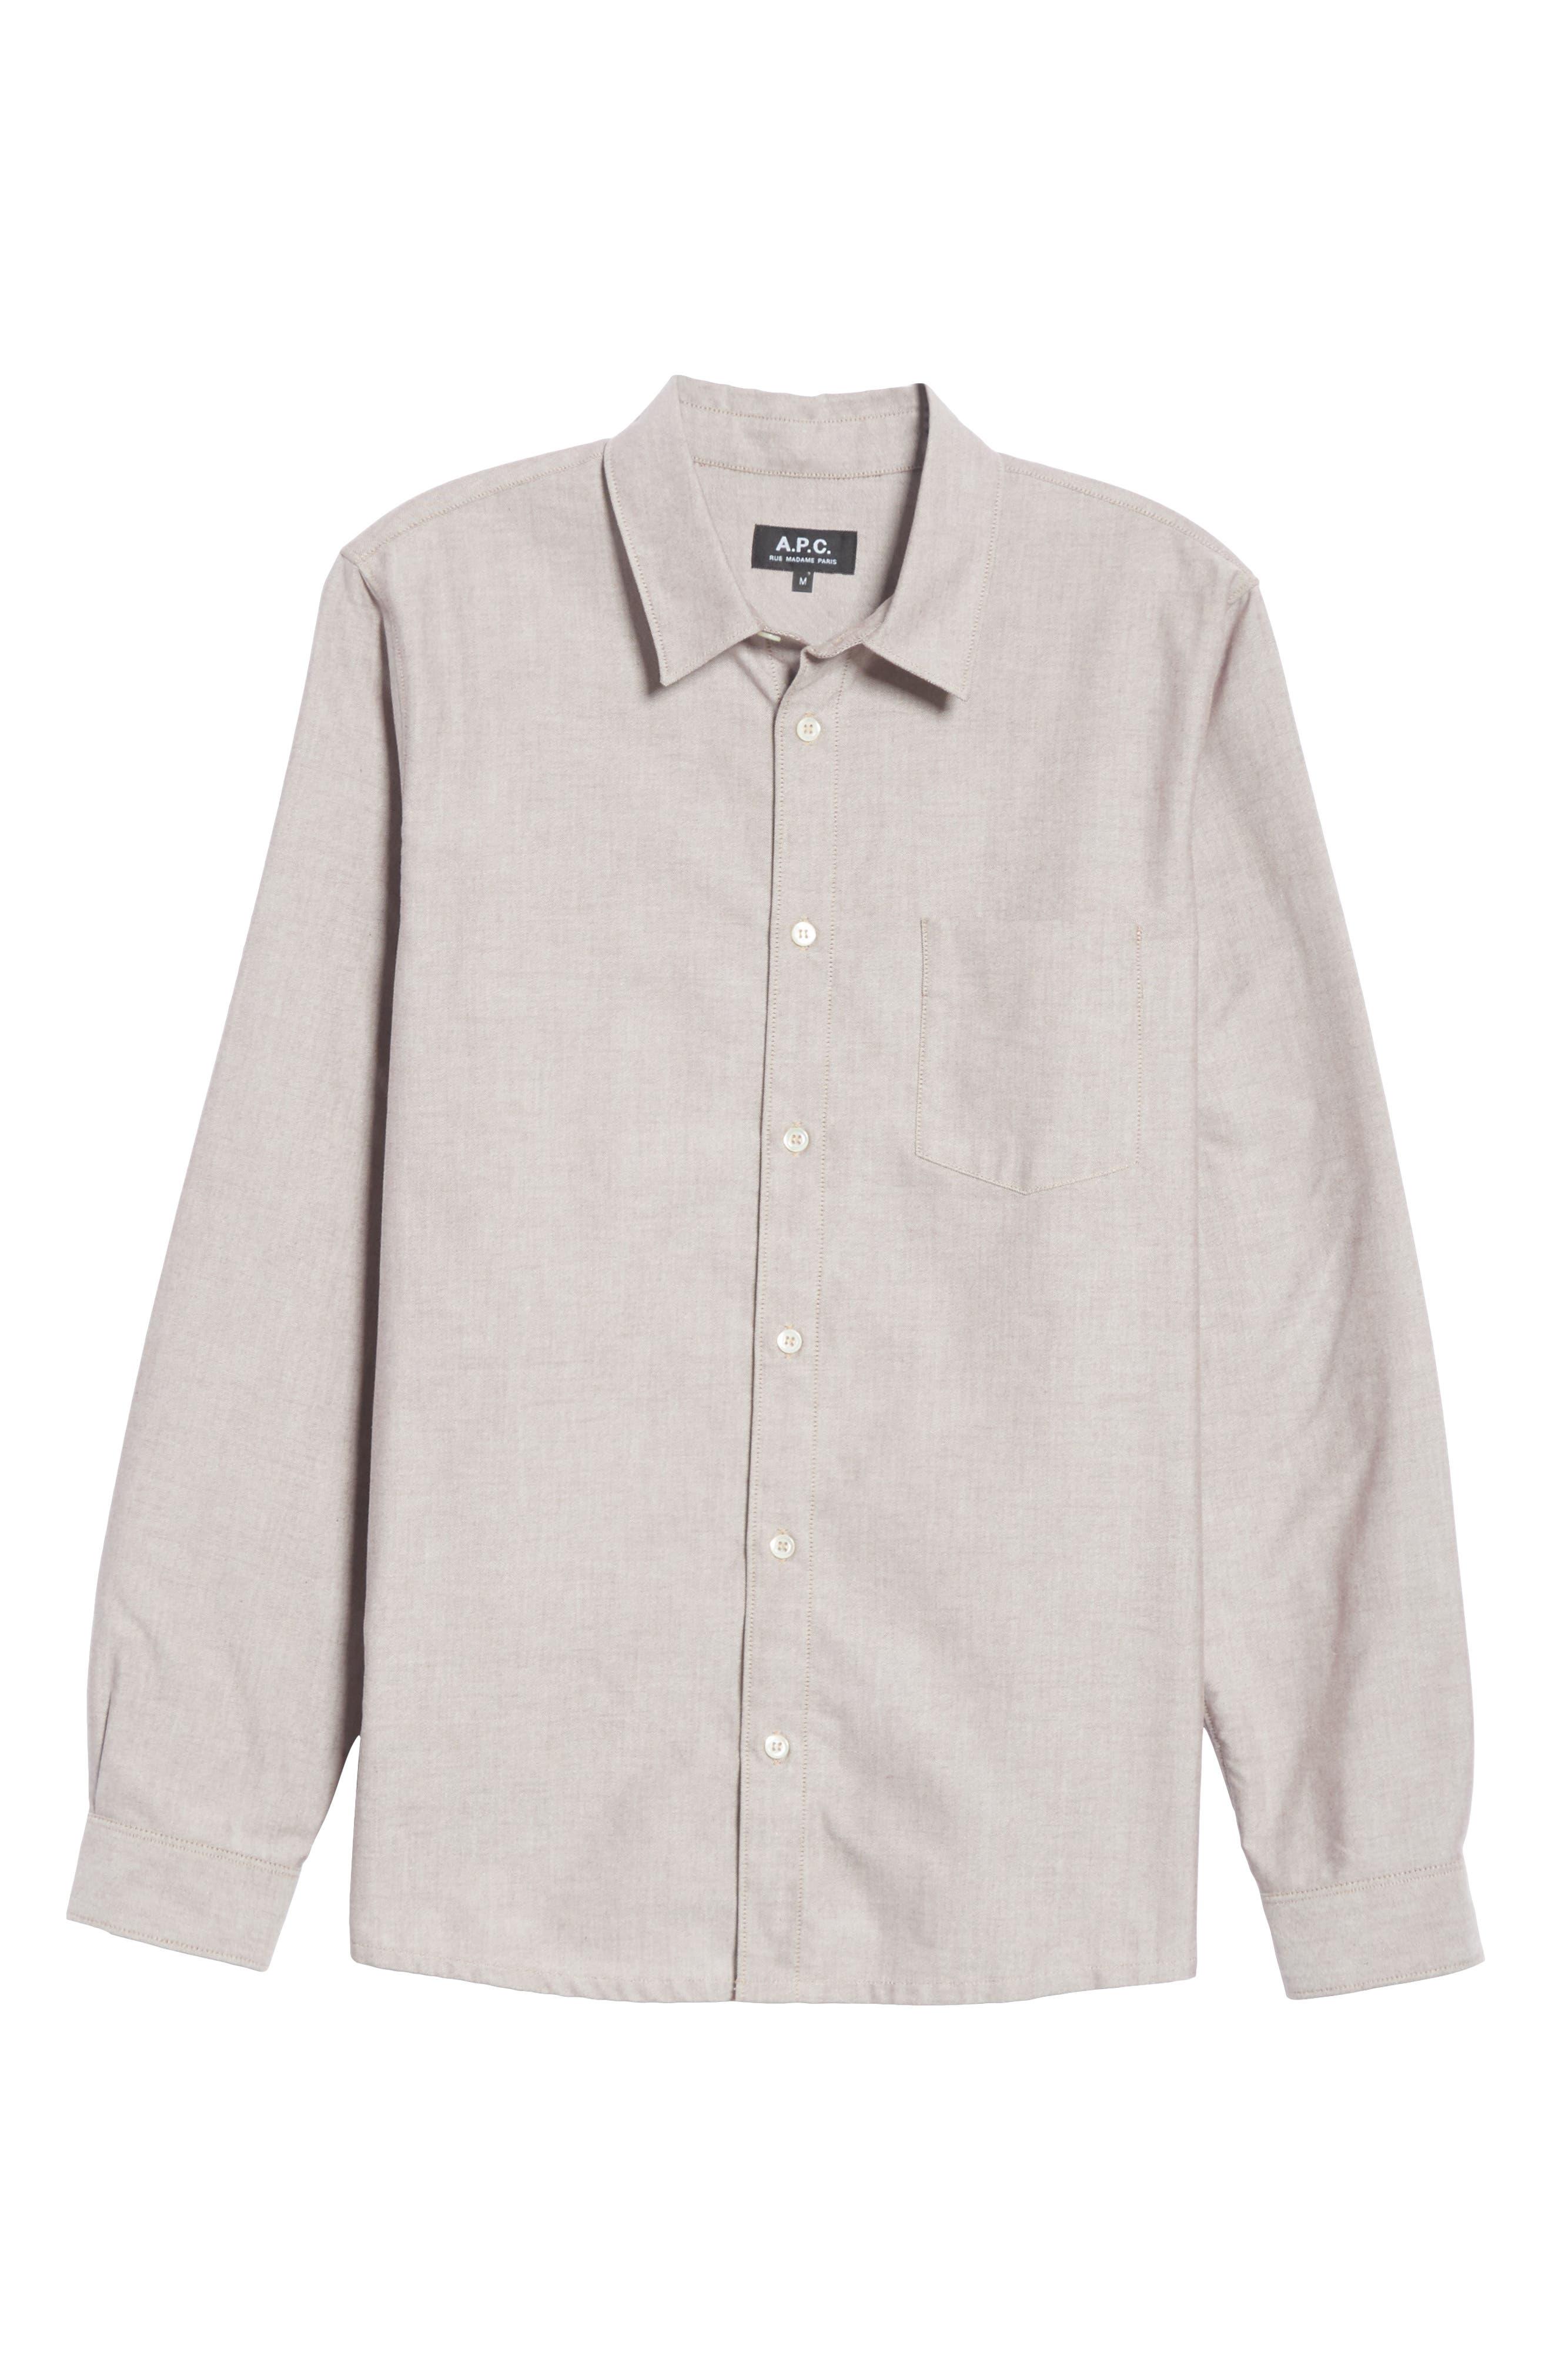 Oxford Sport Shirt,                             Alternate thumbnail 6, color,                             GAC BORDE